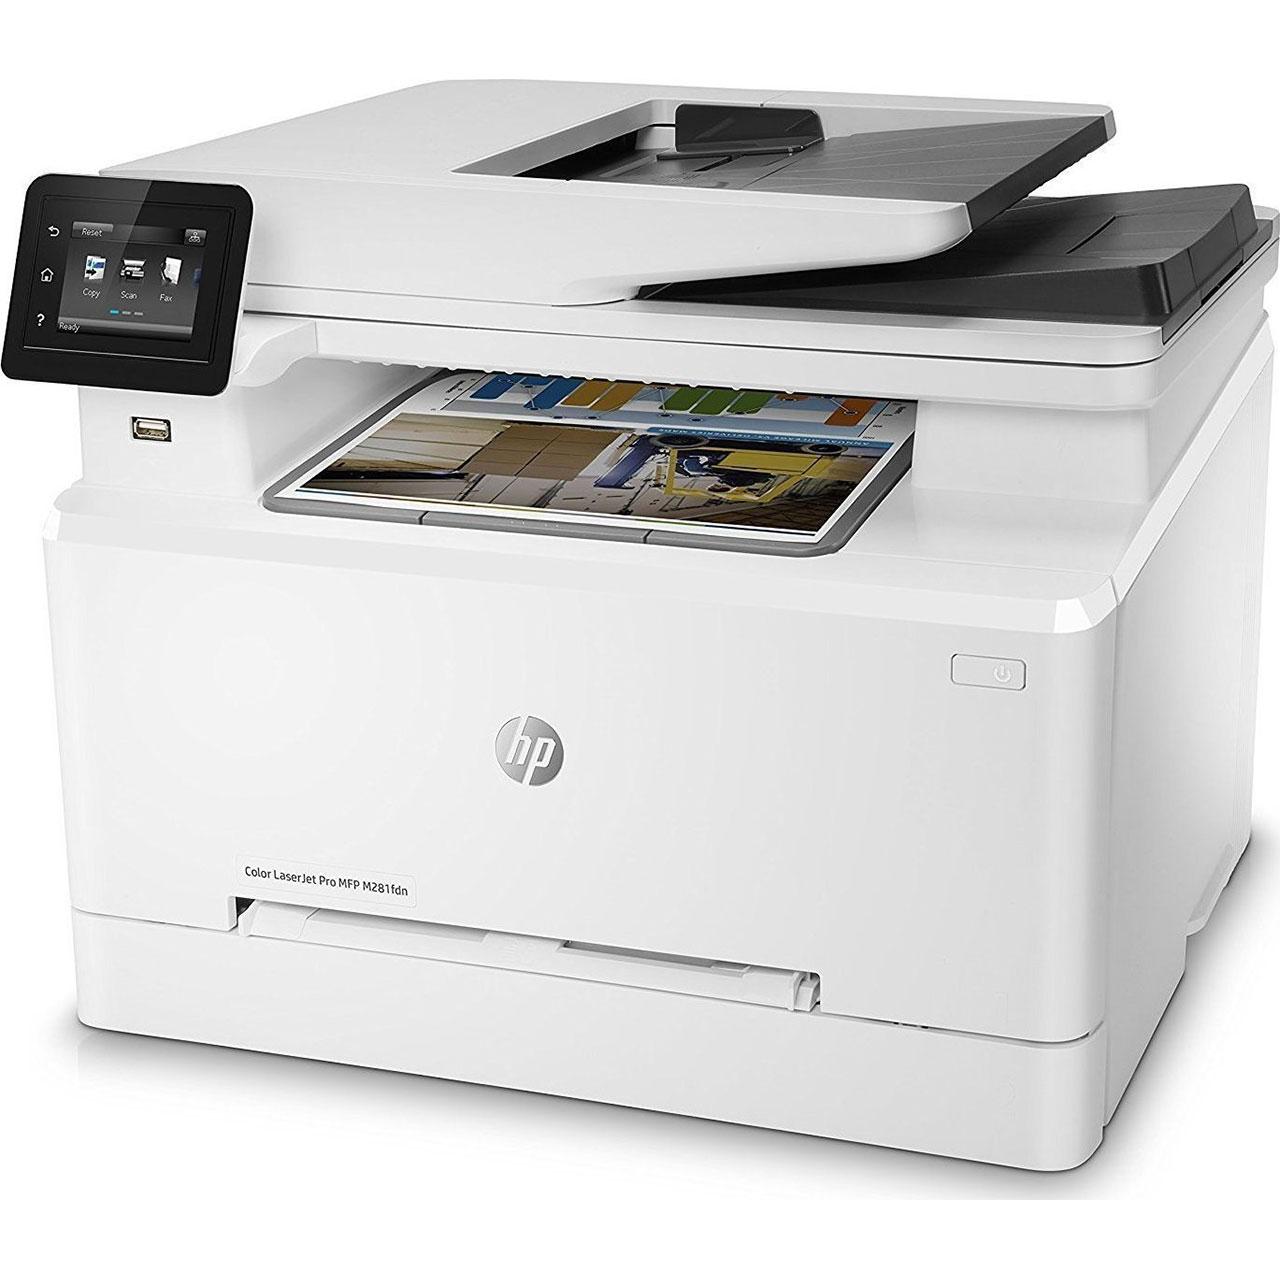 HP Color LaserJet Pro MFP M281fdn toner